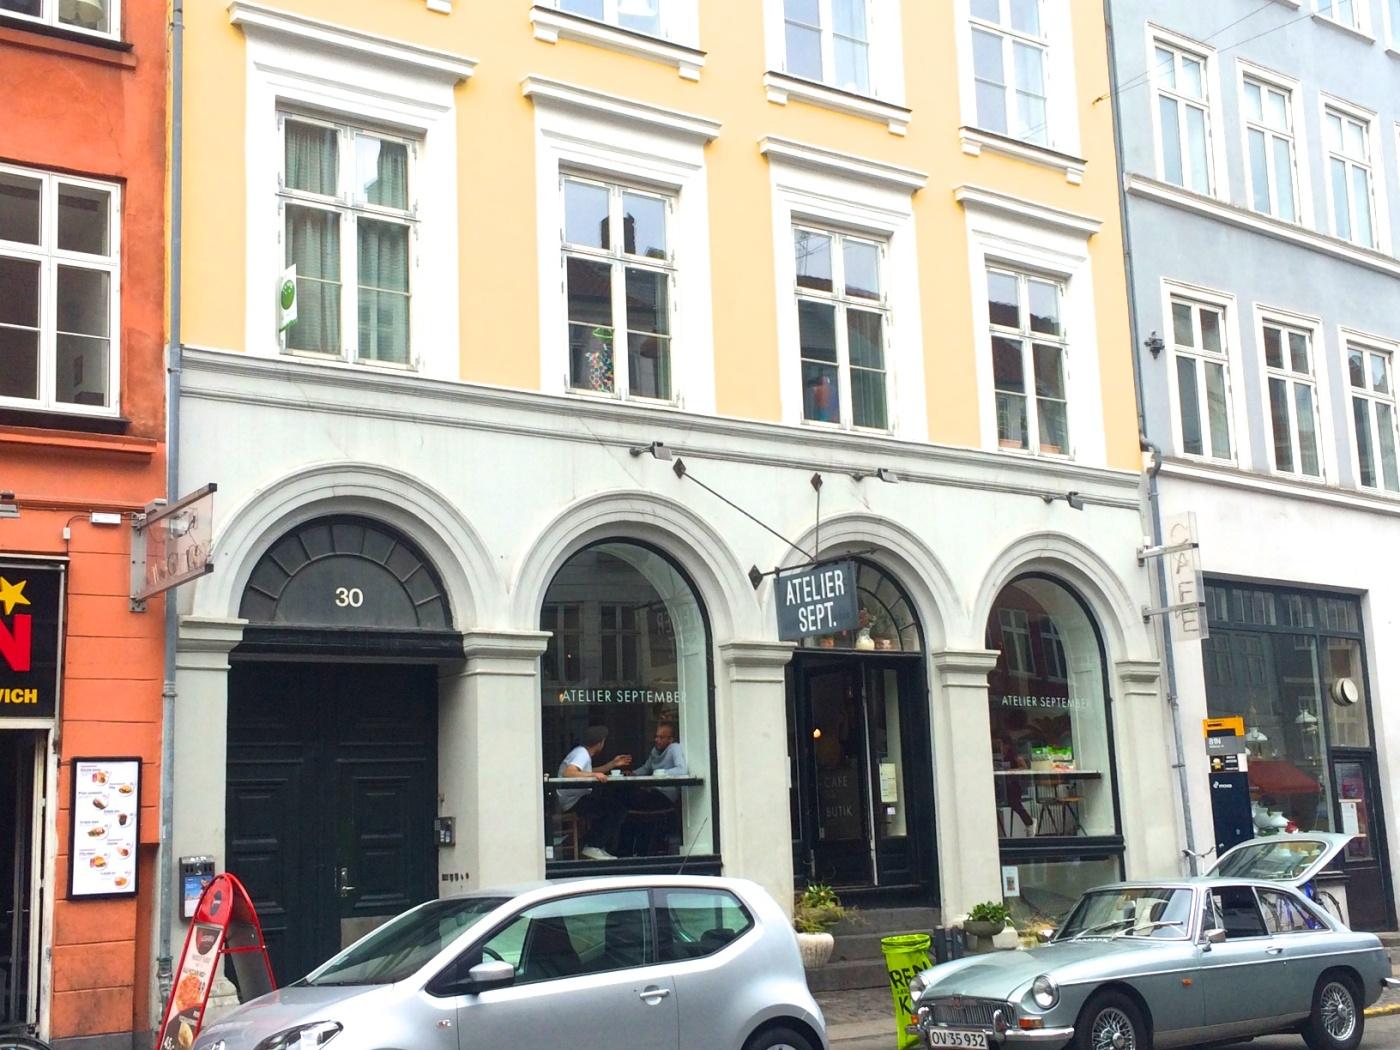 Gothersgade 30, 1123 Copenhagen, Denmark